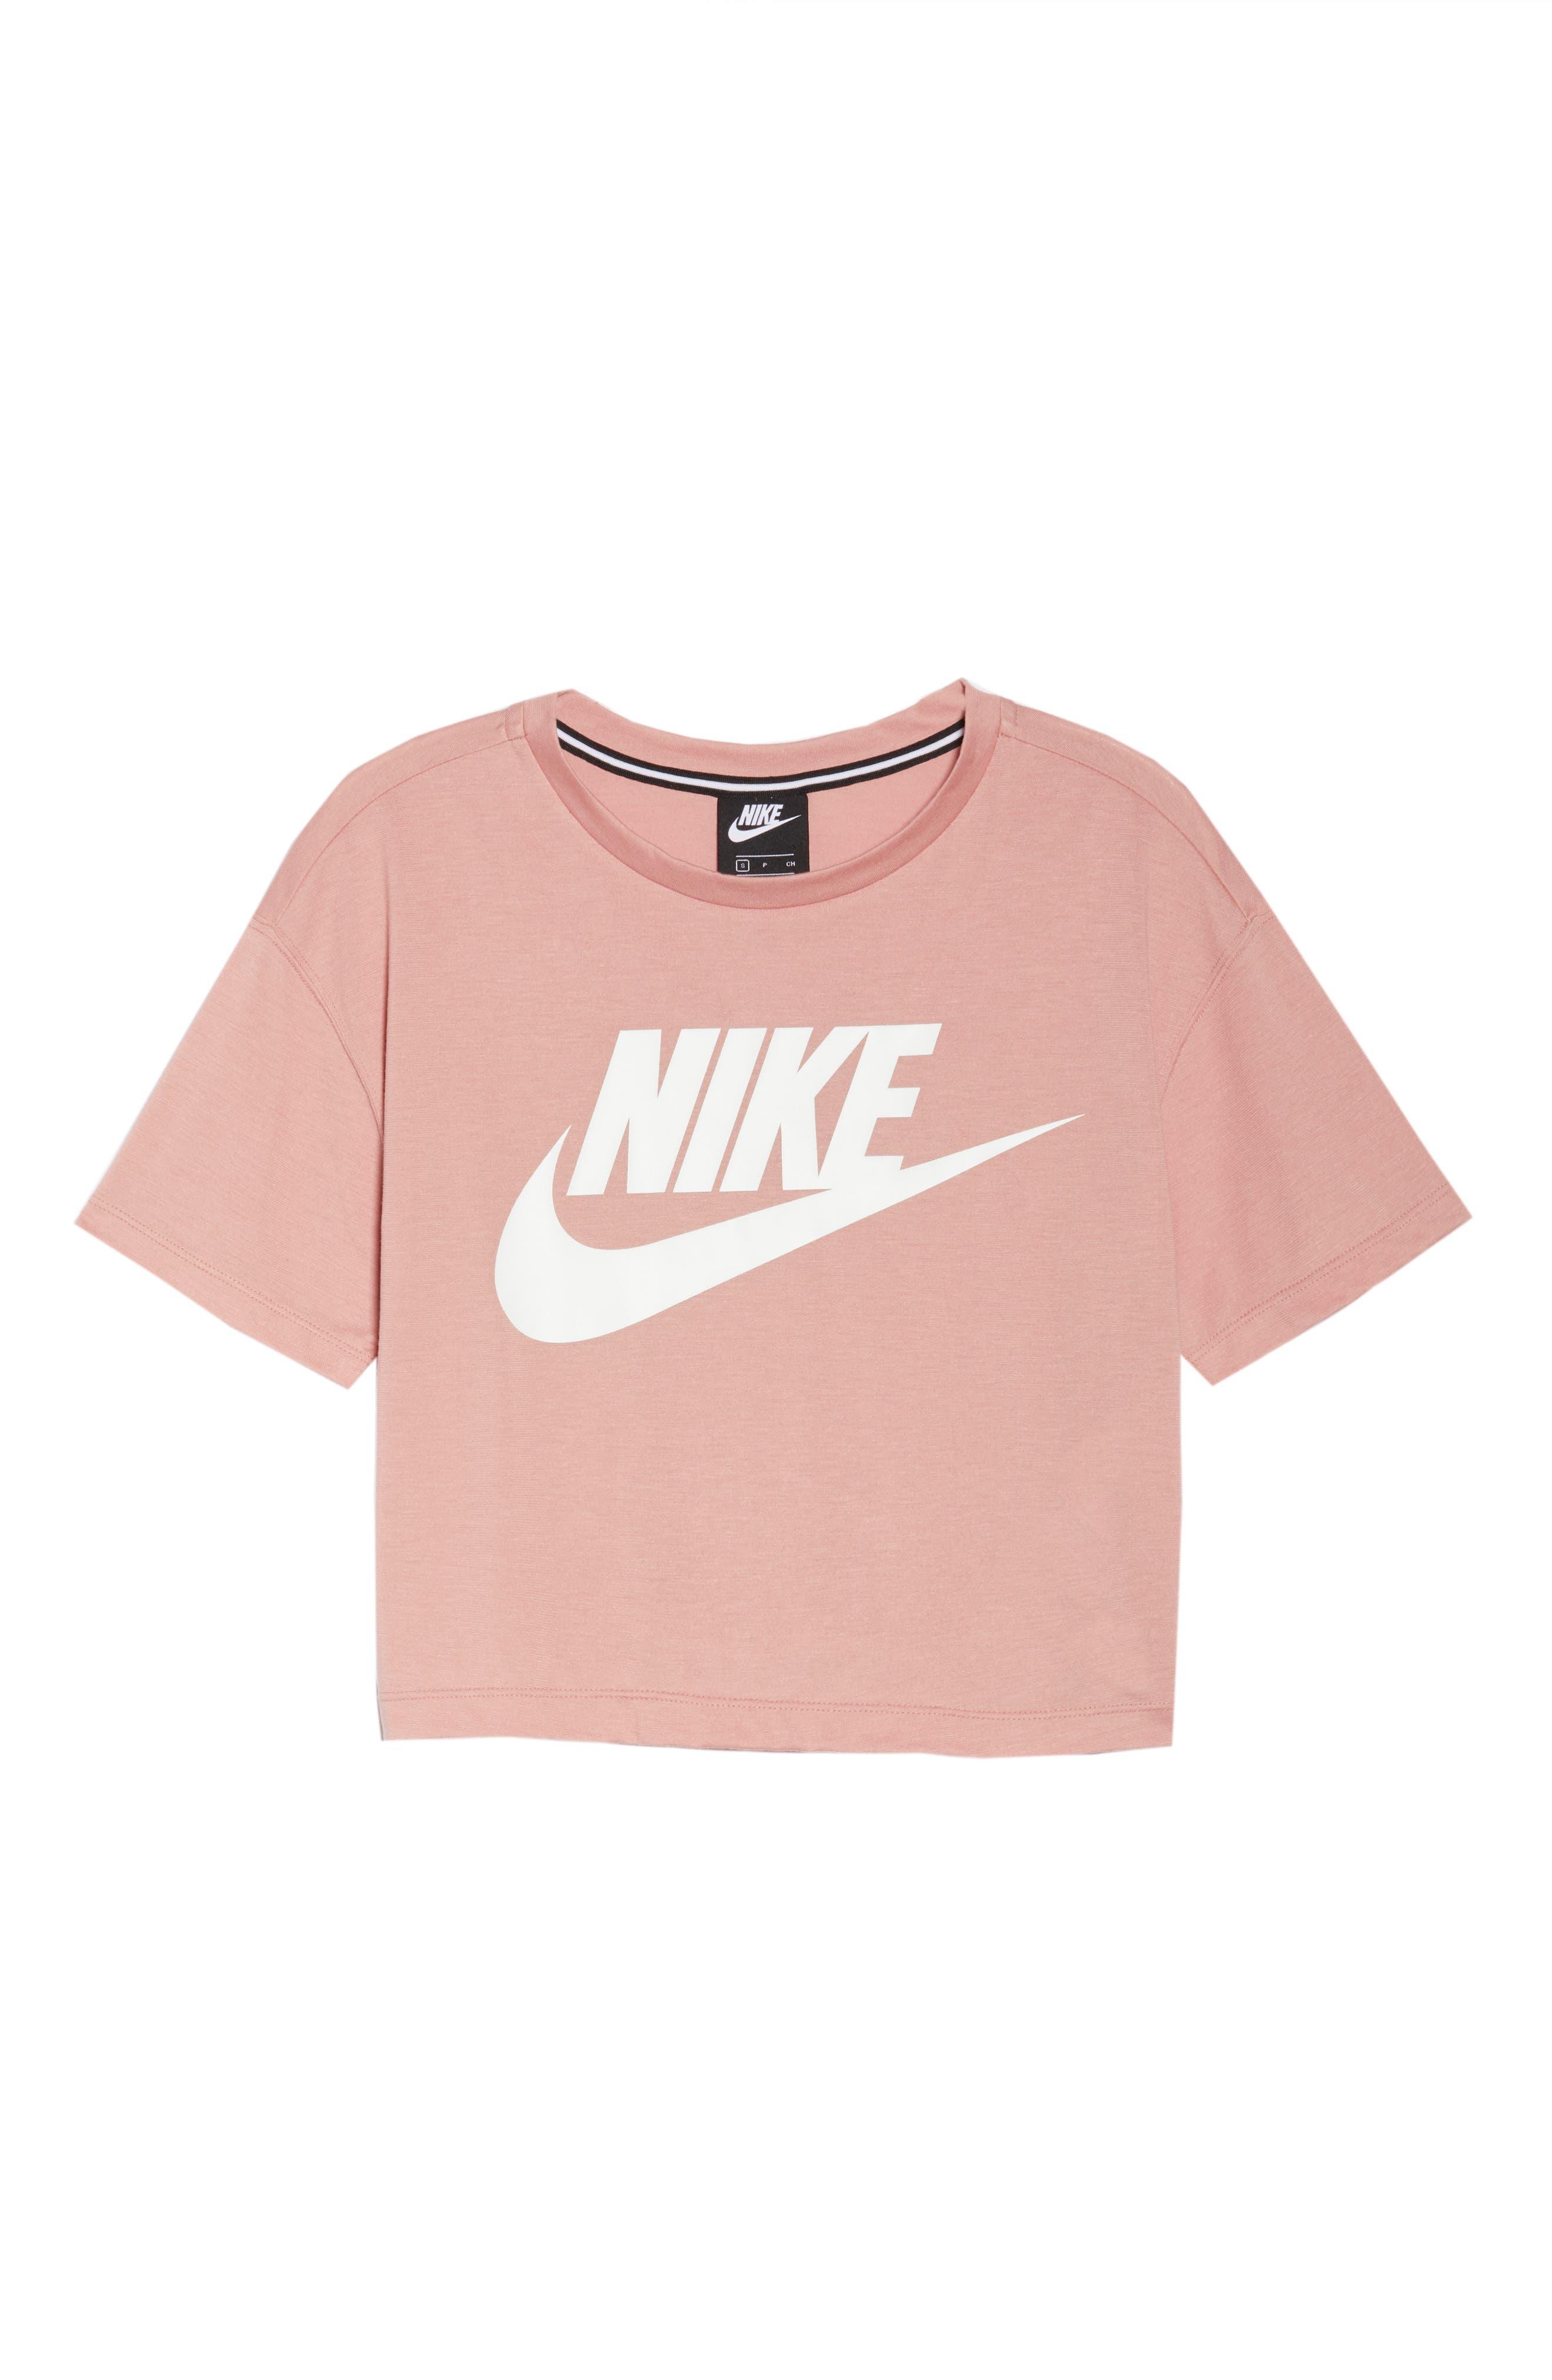 Sportswear Crop Top,                             Alternate thumbnail 7, color,                             Rust Pink/ White